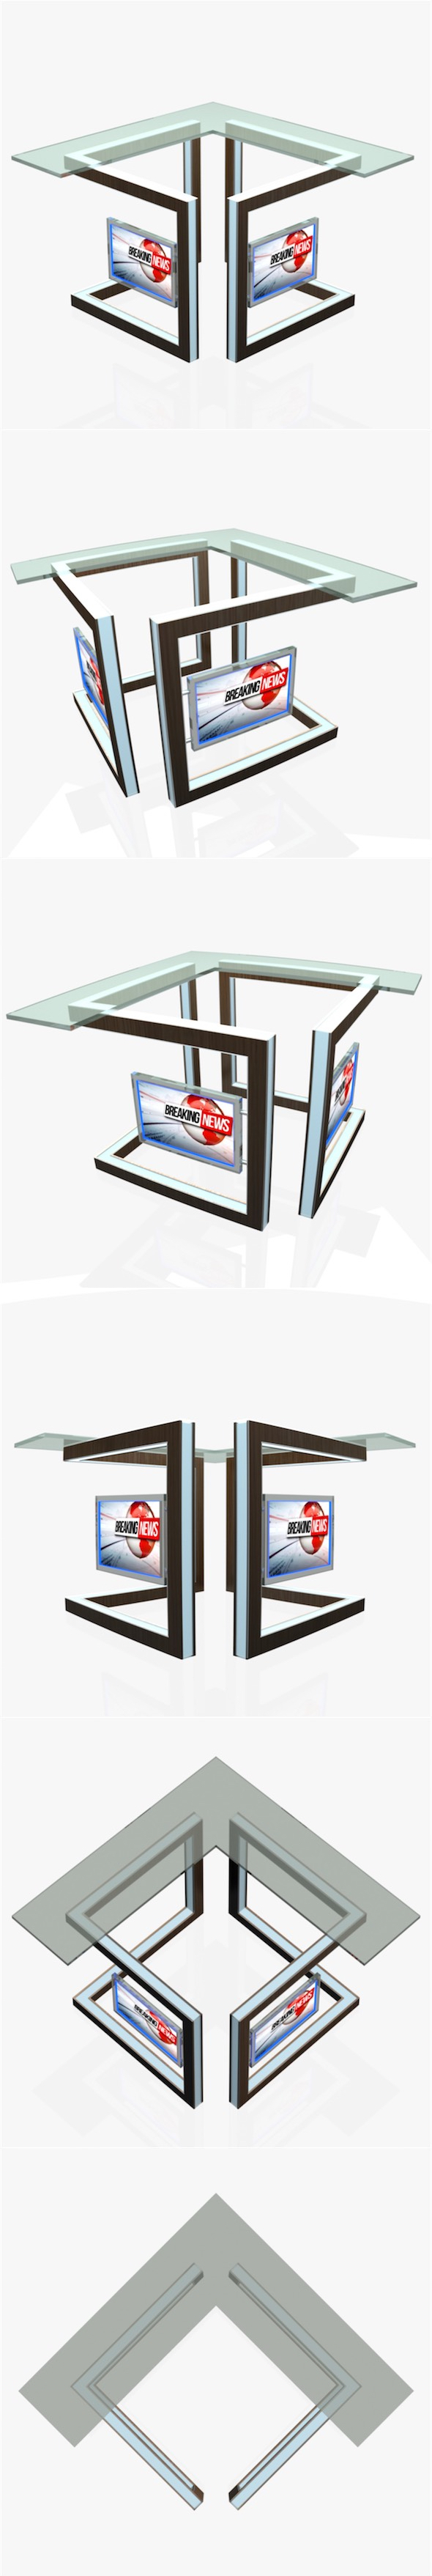 Virtual Tv Studio News Desk 3 - 3DOcean Item for Sale